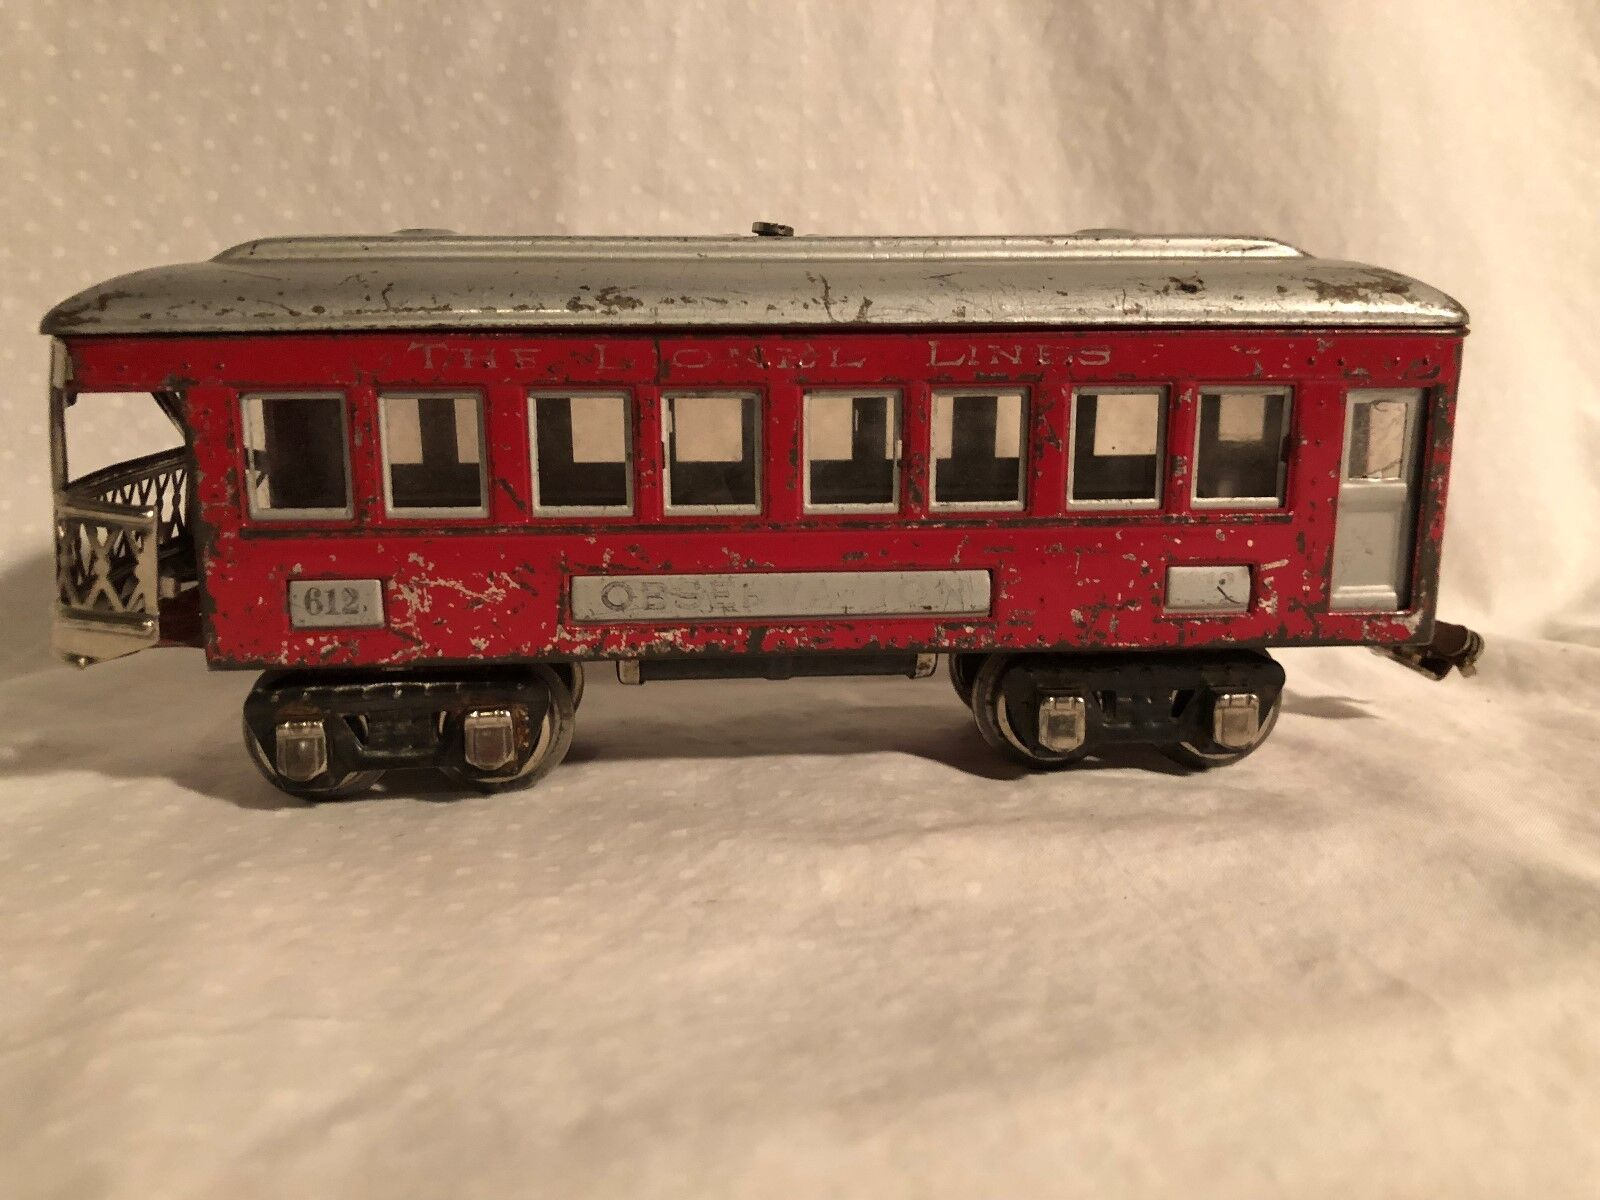 Lionel 612 Observation Car RARE color combo